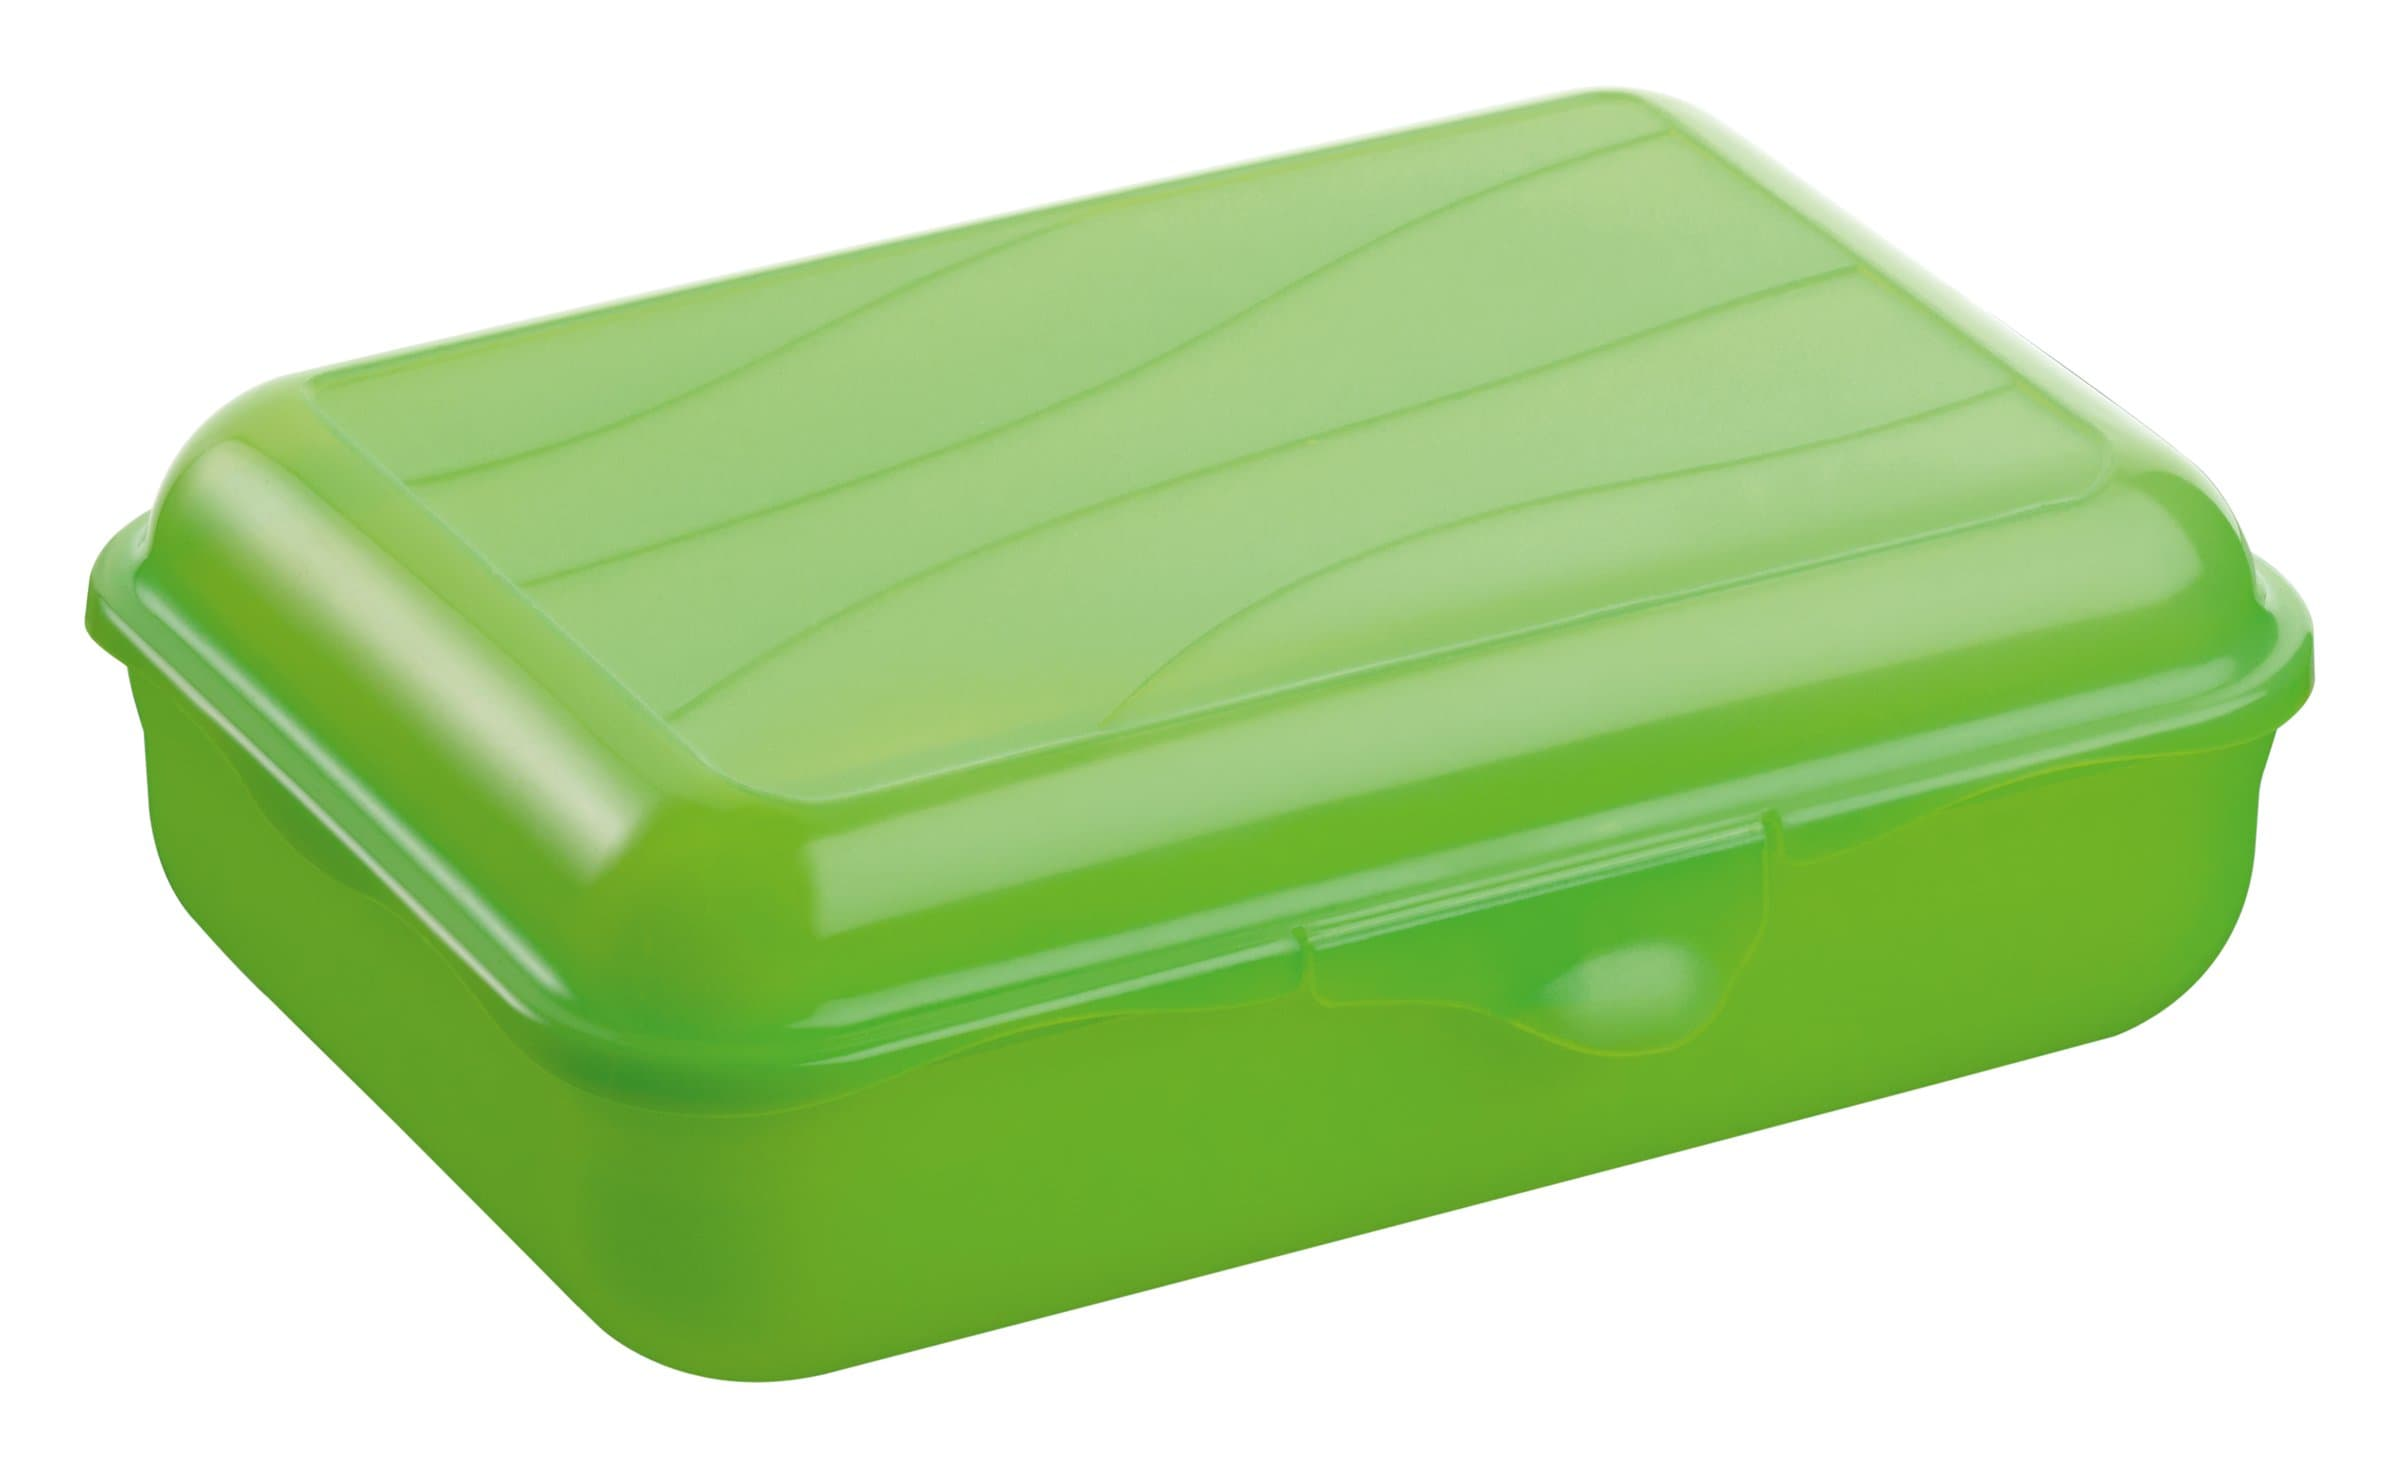 CLIC-CLAC BOX 1.25L